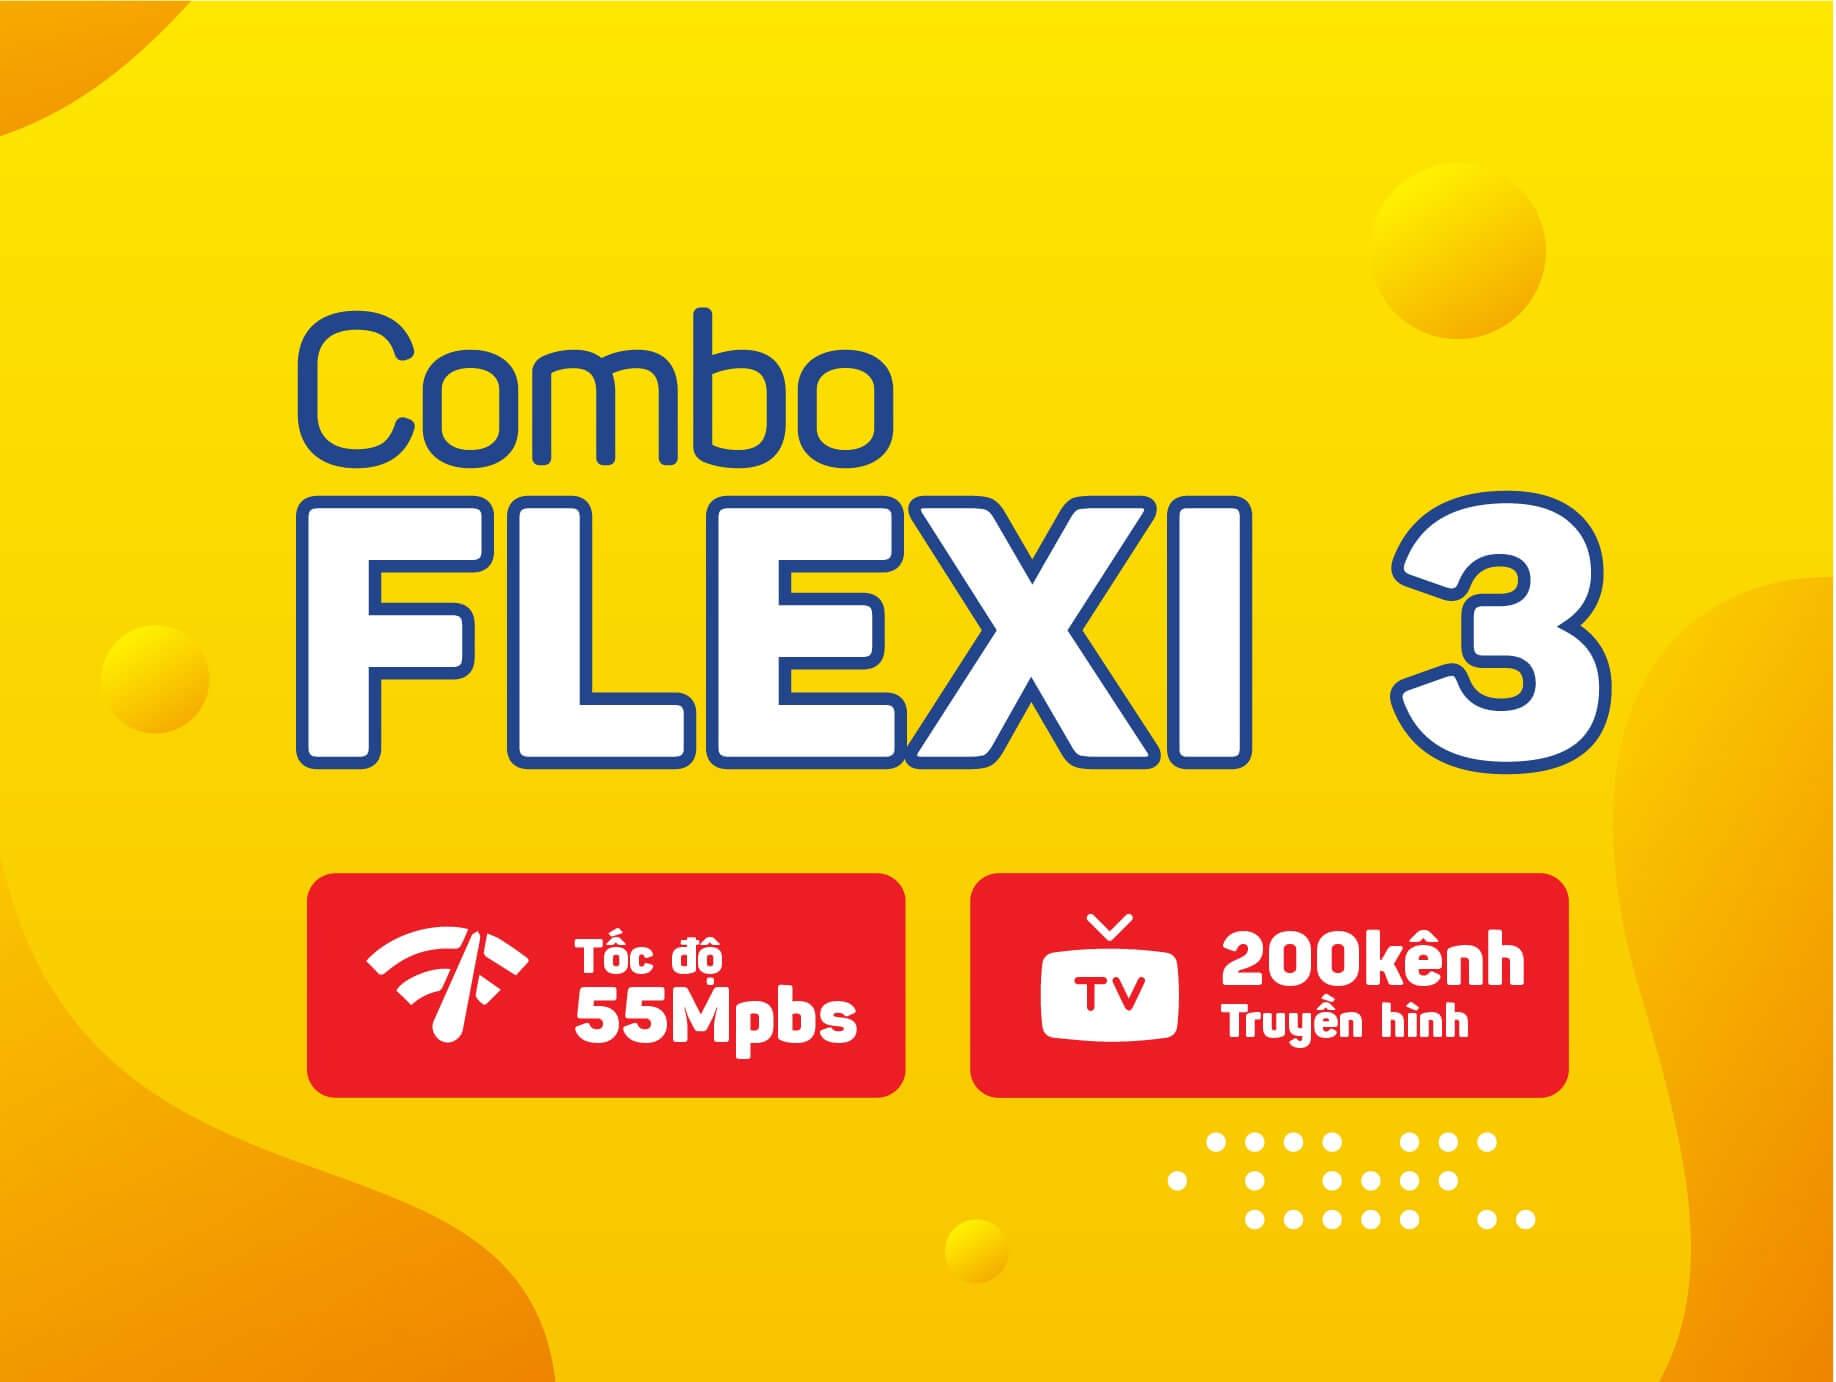 Combo internet truyền hình flexi 3